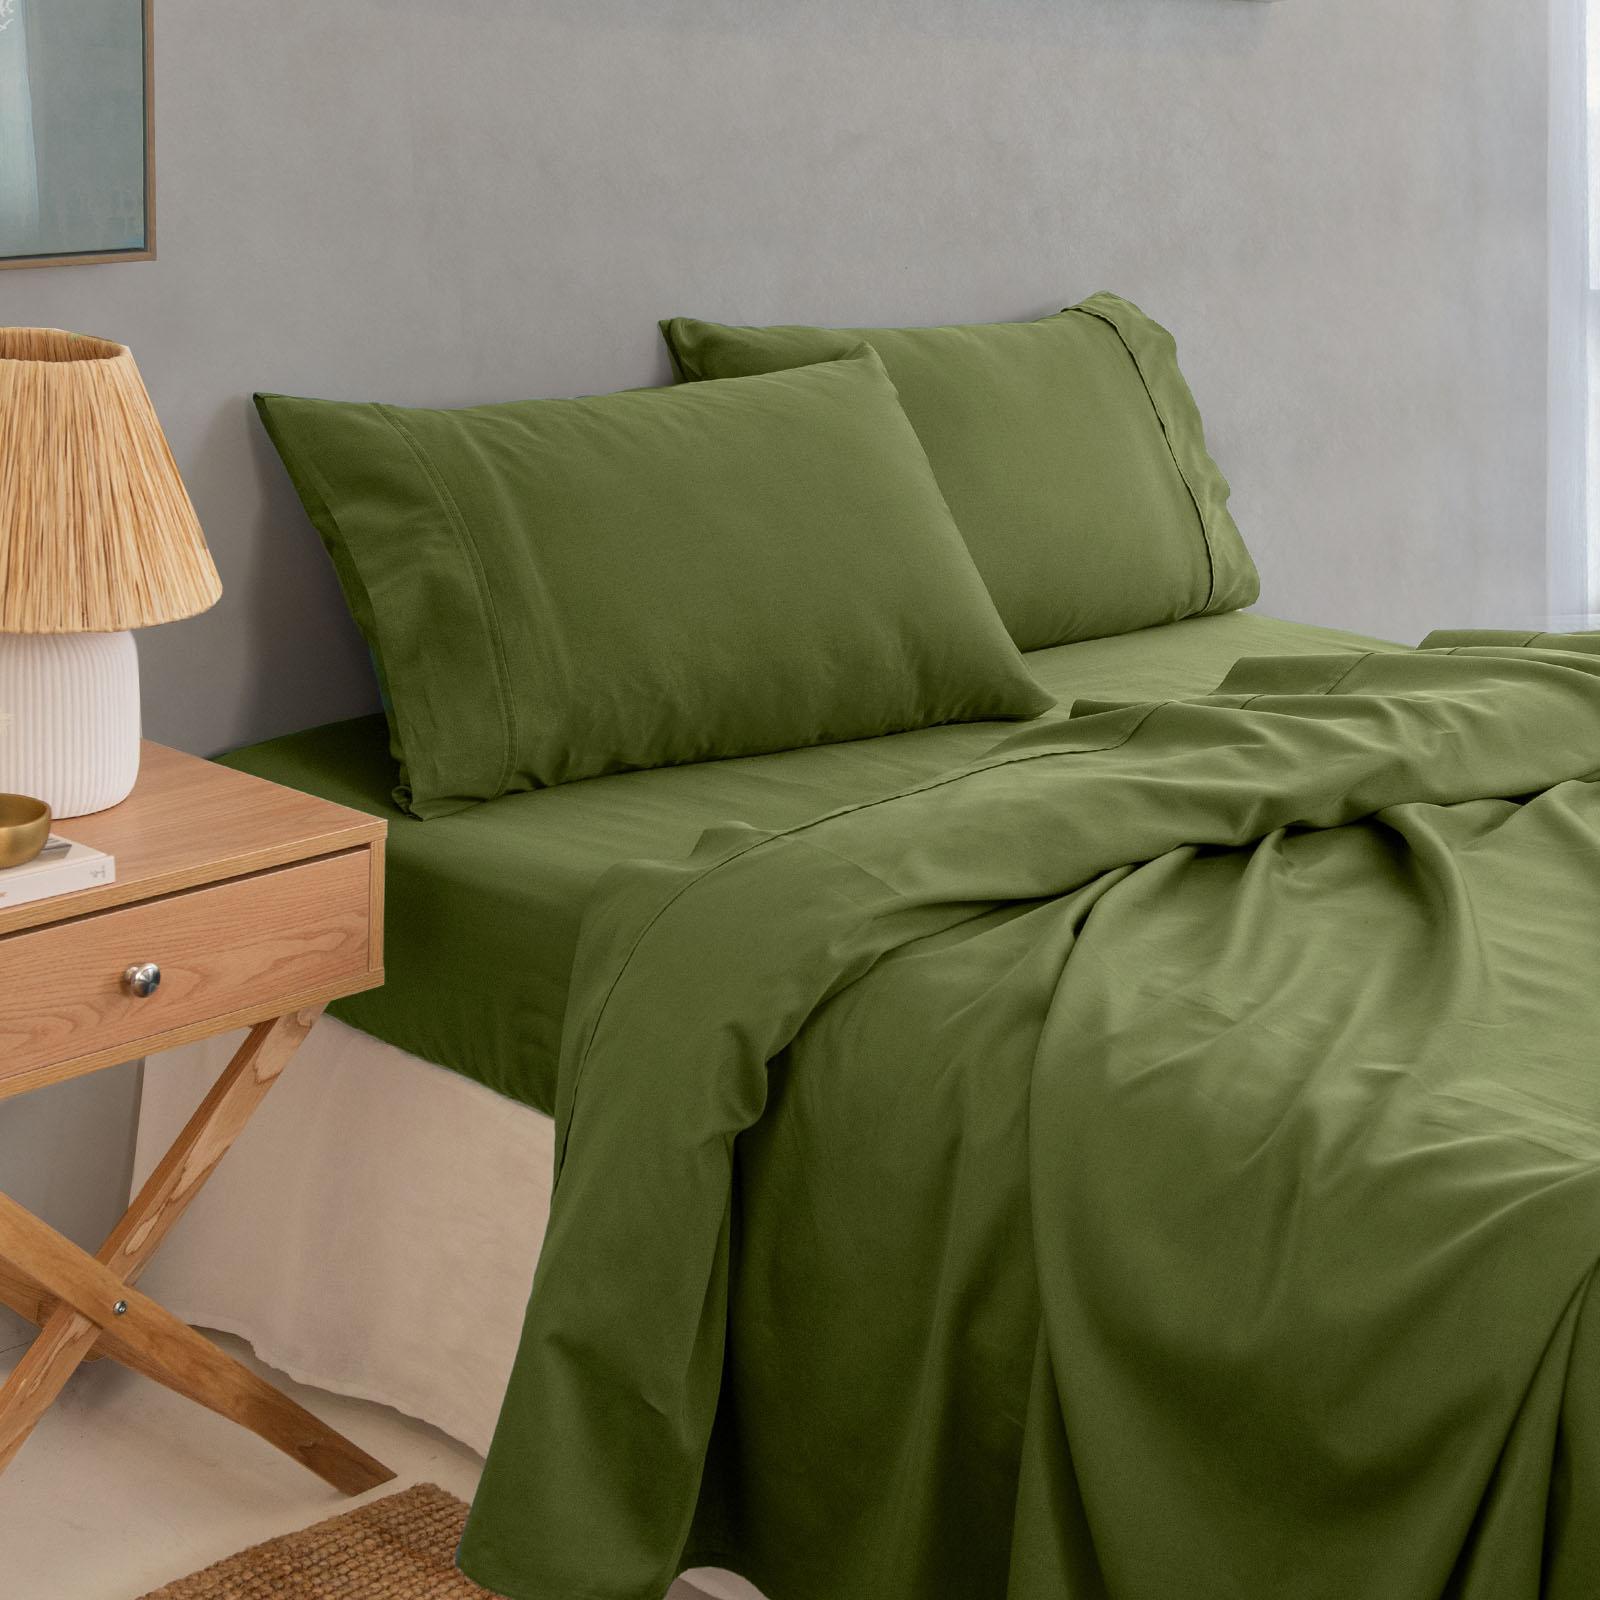 thumbnail 54 - Royal Comfort 1000TC Hotel Grade Bamboo Cotton Sheets Pillowcases Set Ultrasoft